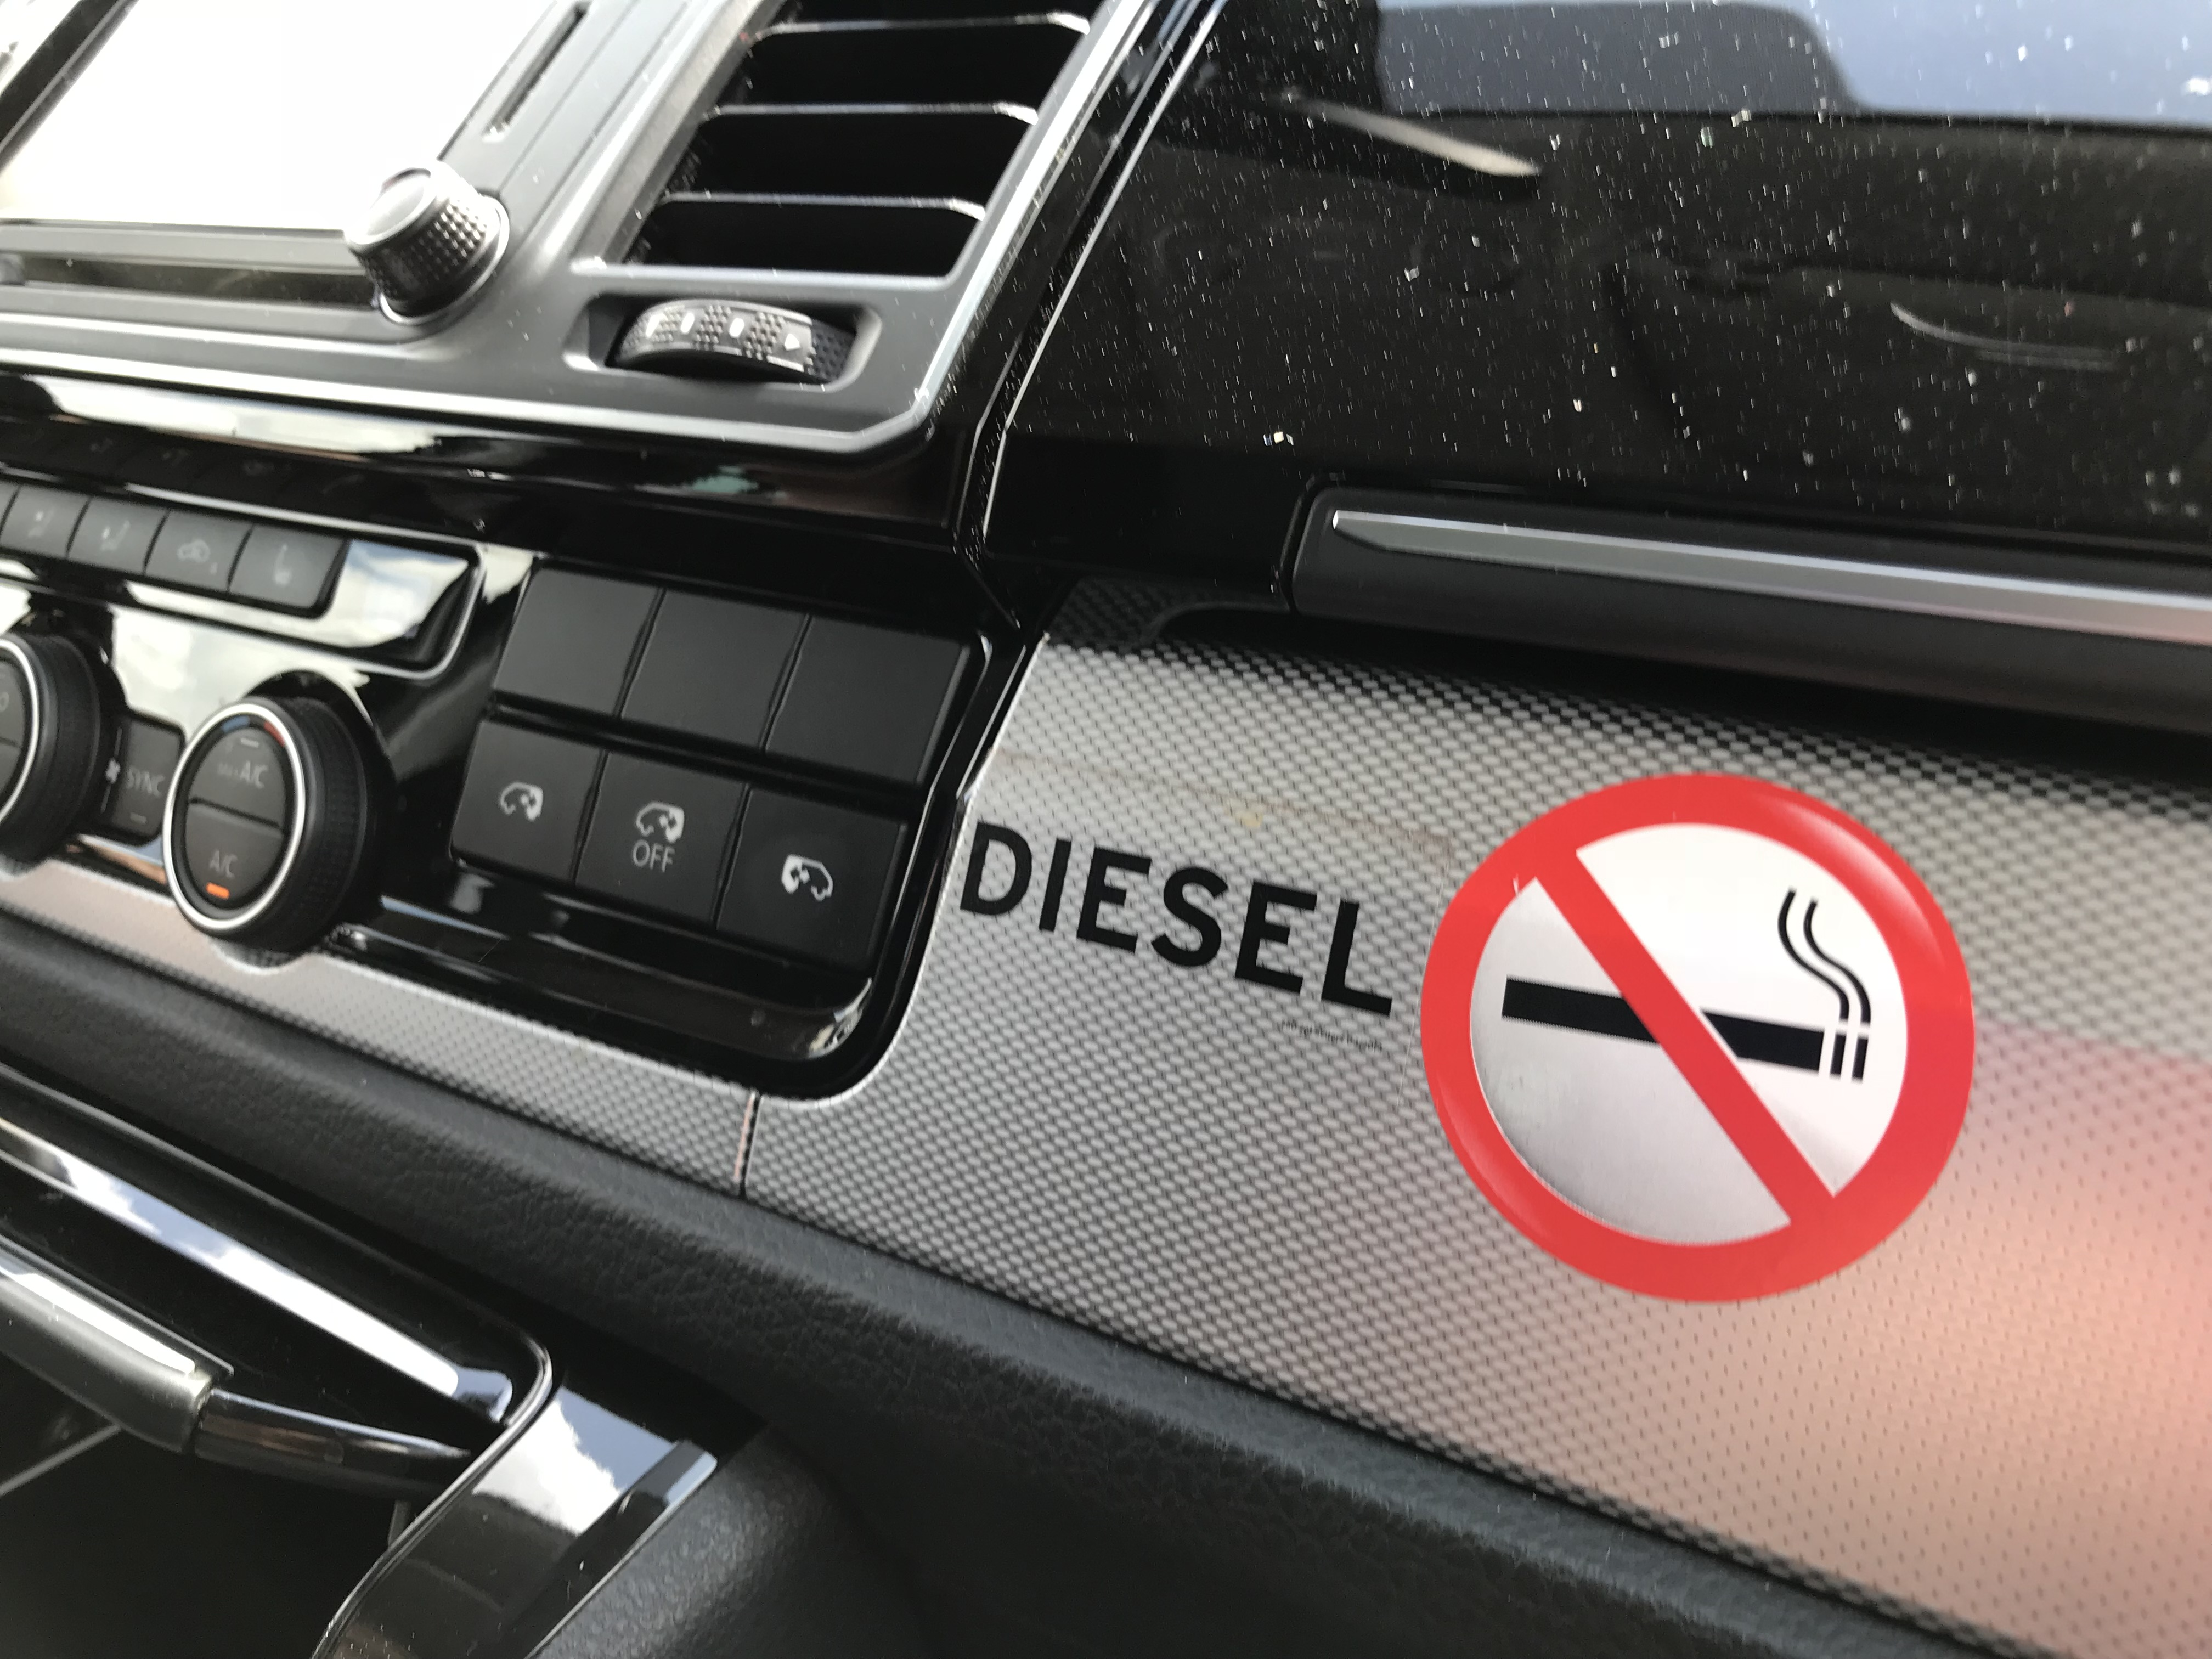 Volkswagen Transporter diesel IMG_2374